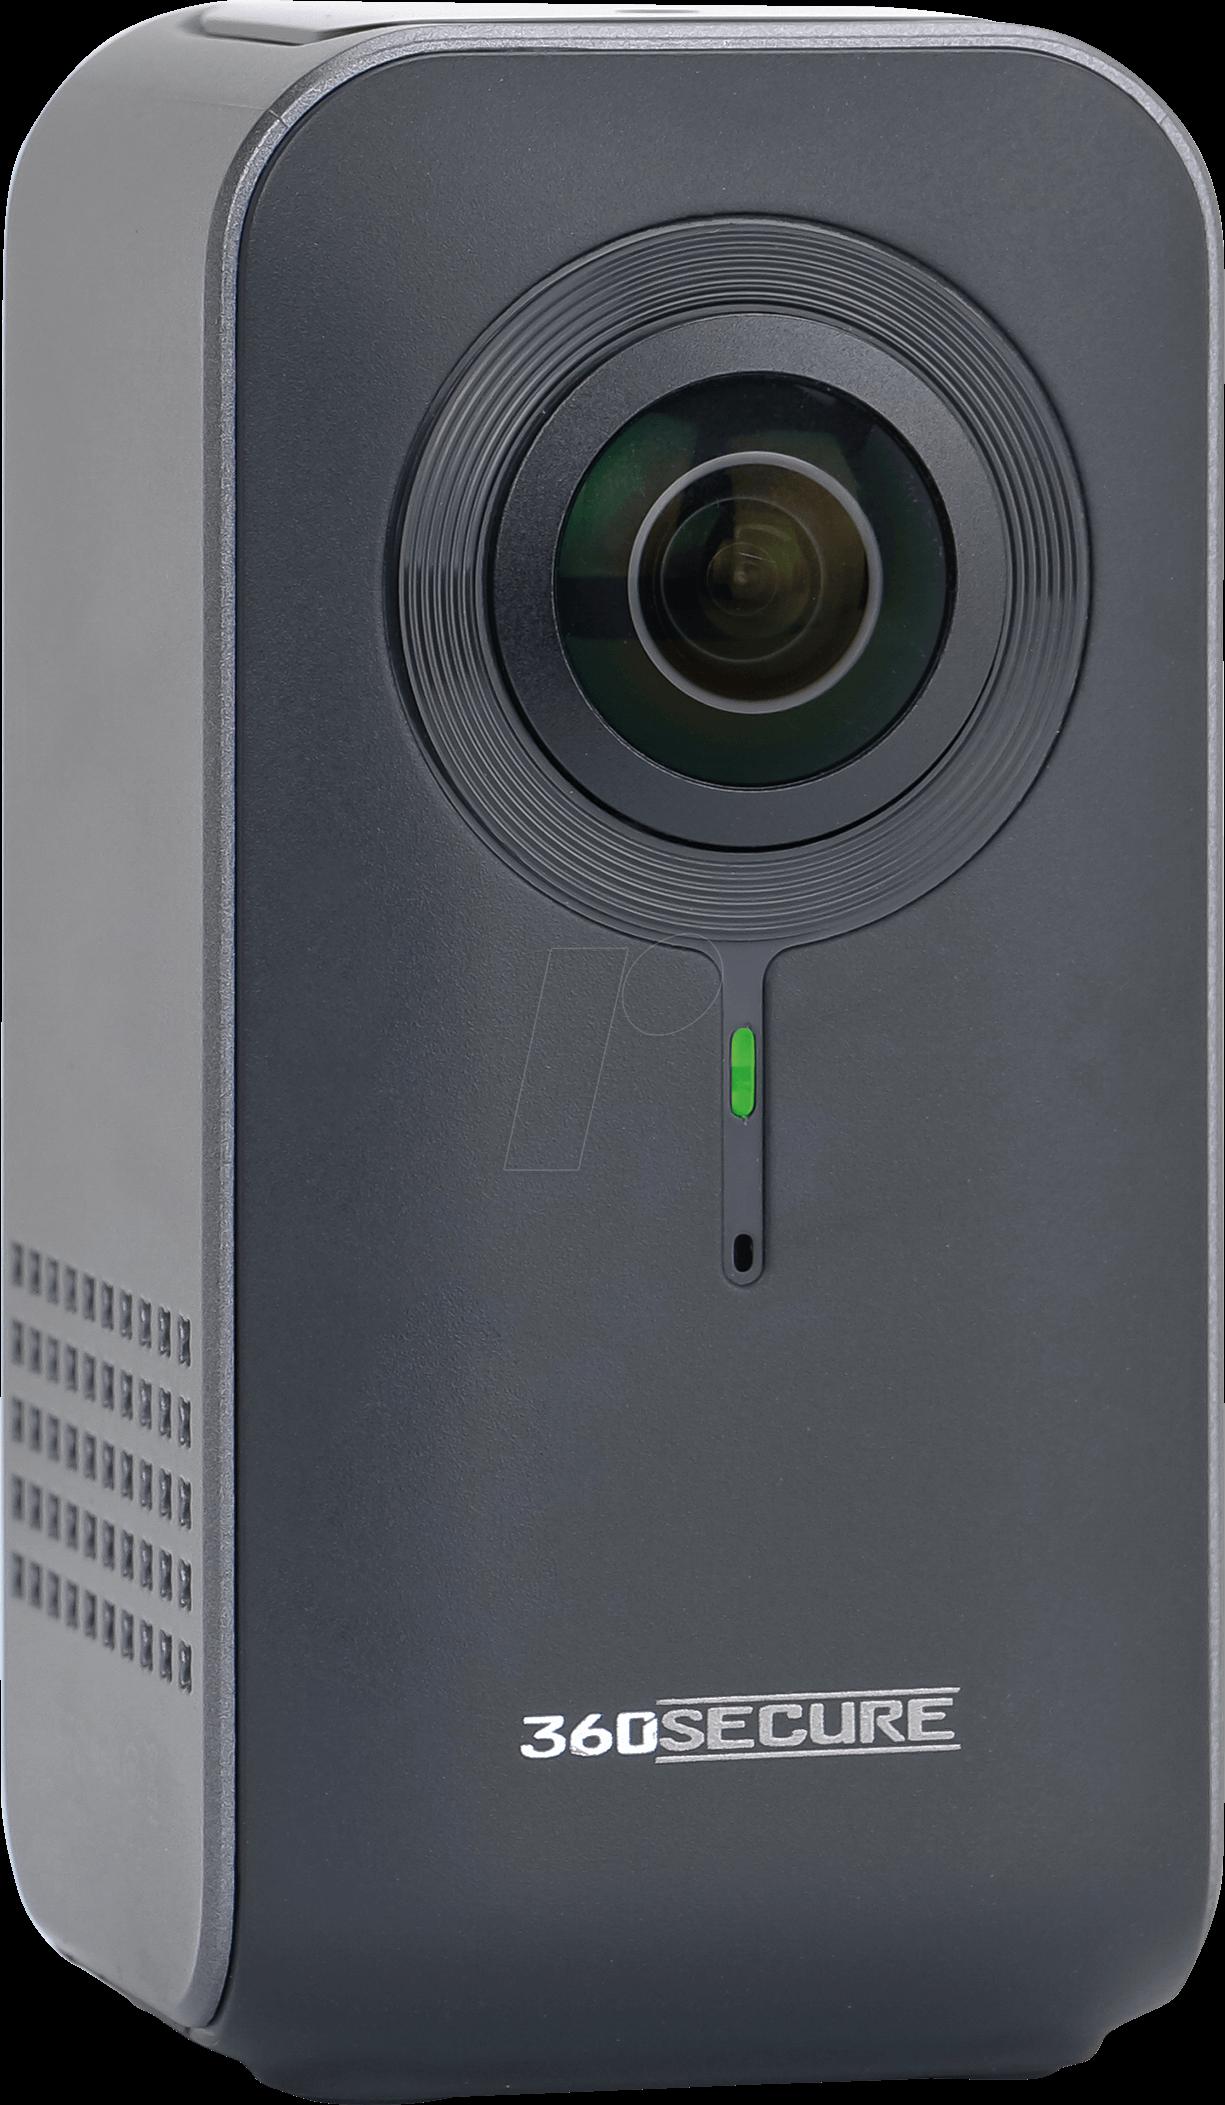 dnt 52190 berwachungskamera 360secure ip wlan innen bei reichelt elektronik. Black Bedroom Furniture Sets. Home Design Ideas